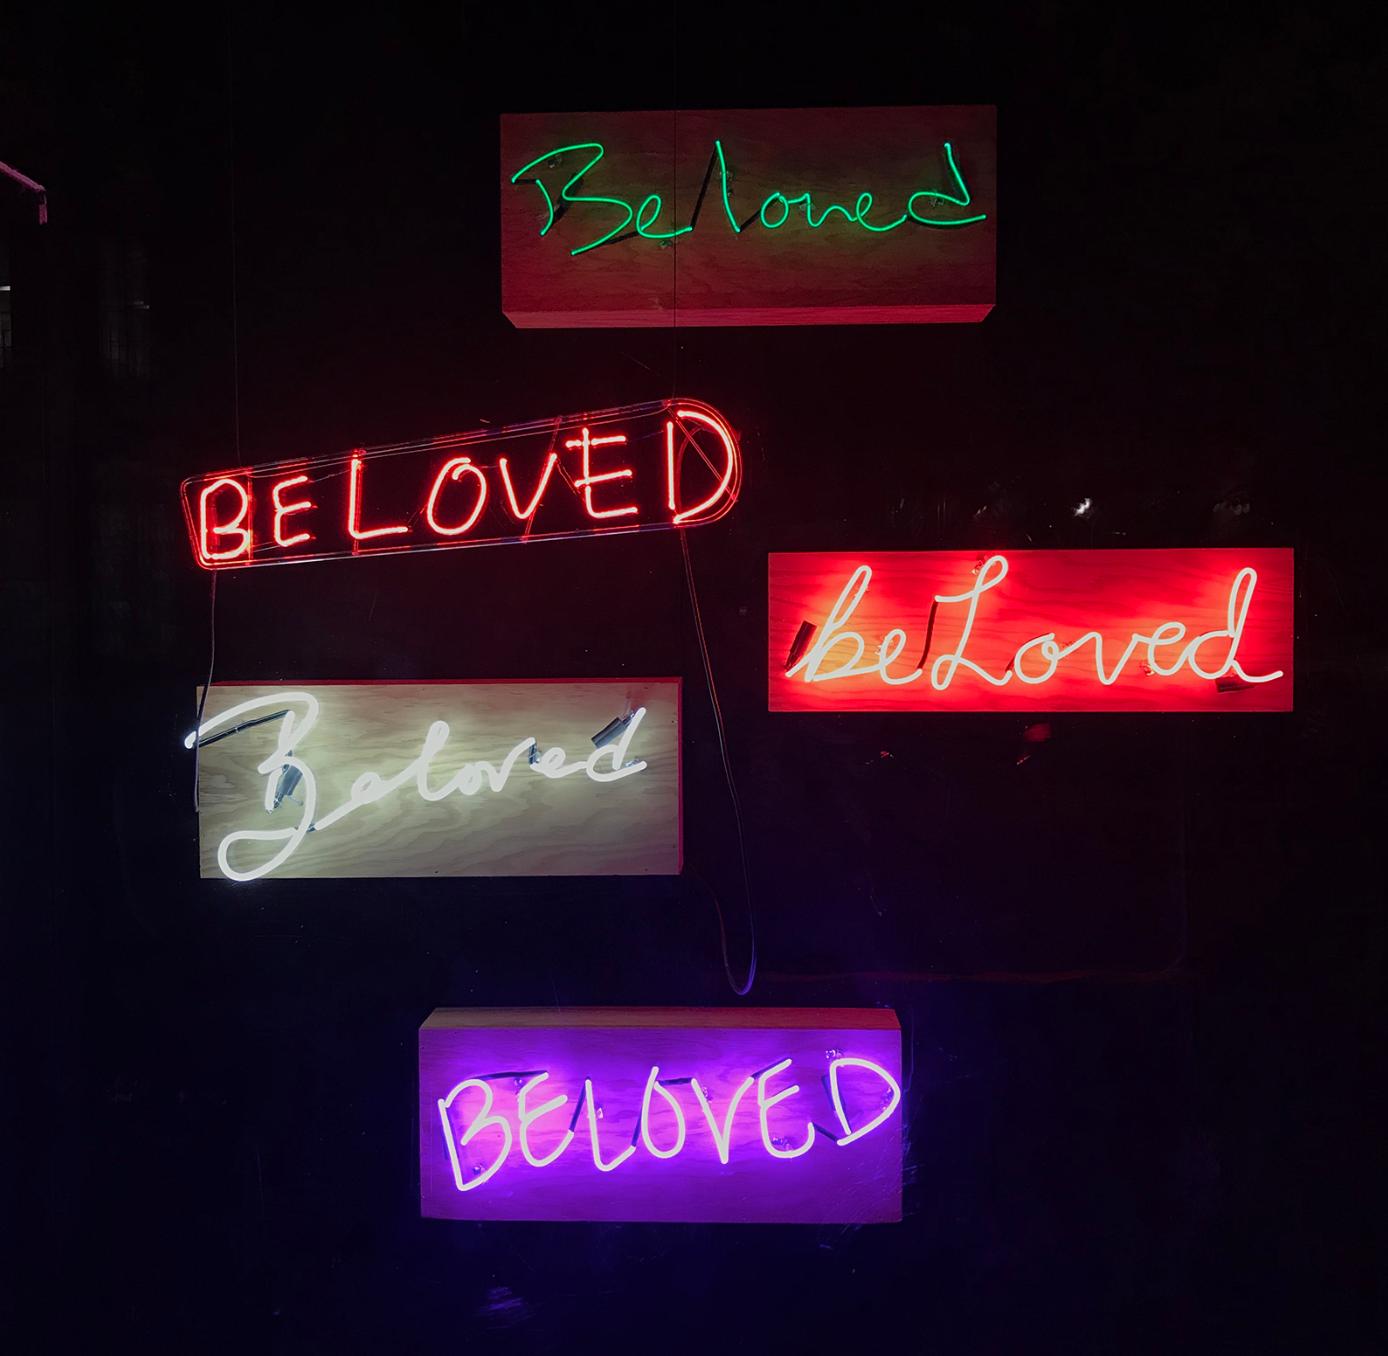 ERIKA DEVRIES, Beloved  Neon, 30 in. x 12 in. x 7 in.